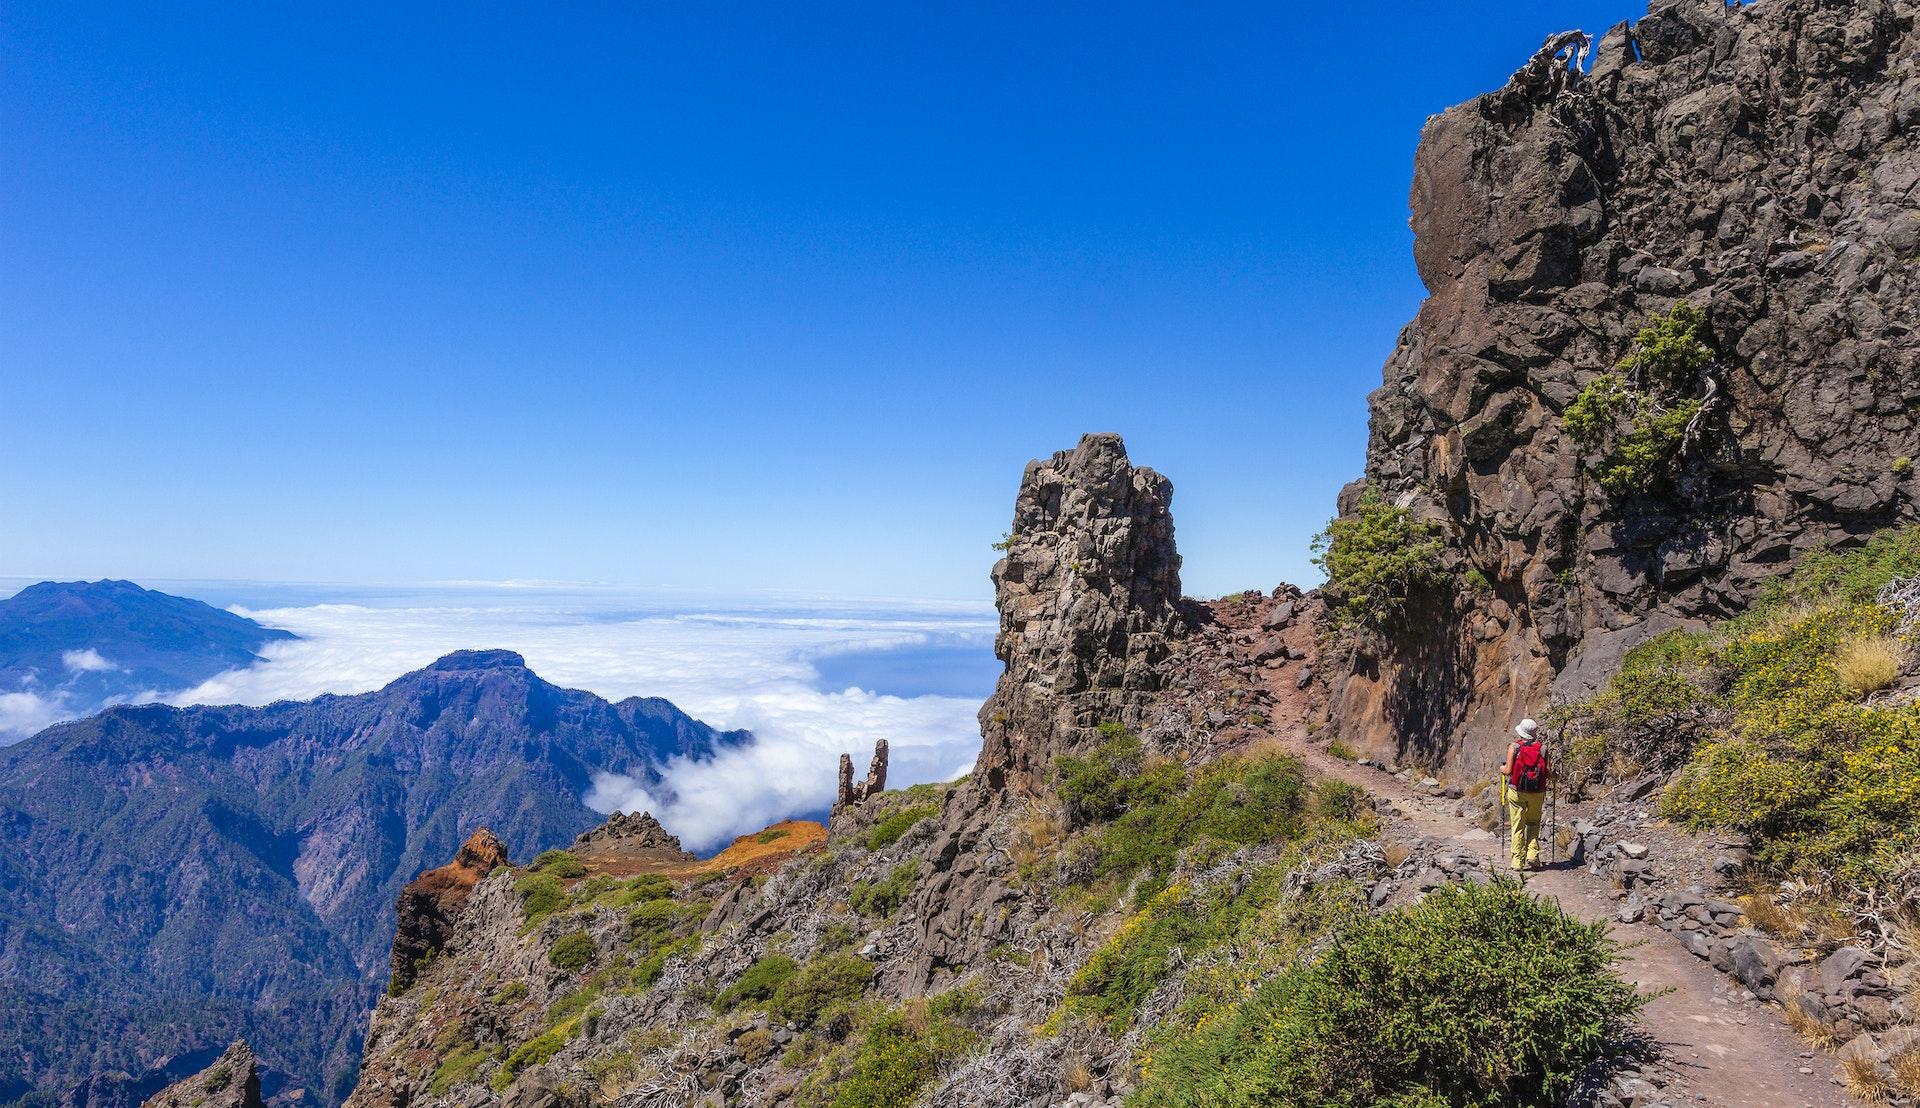 Fantastisk natur på La Palma © Flavio Vallenari, Getty Images